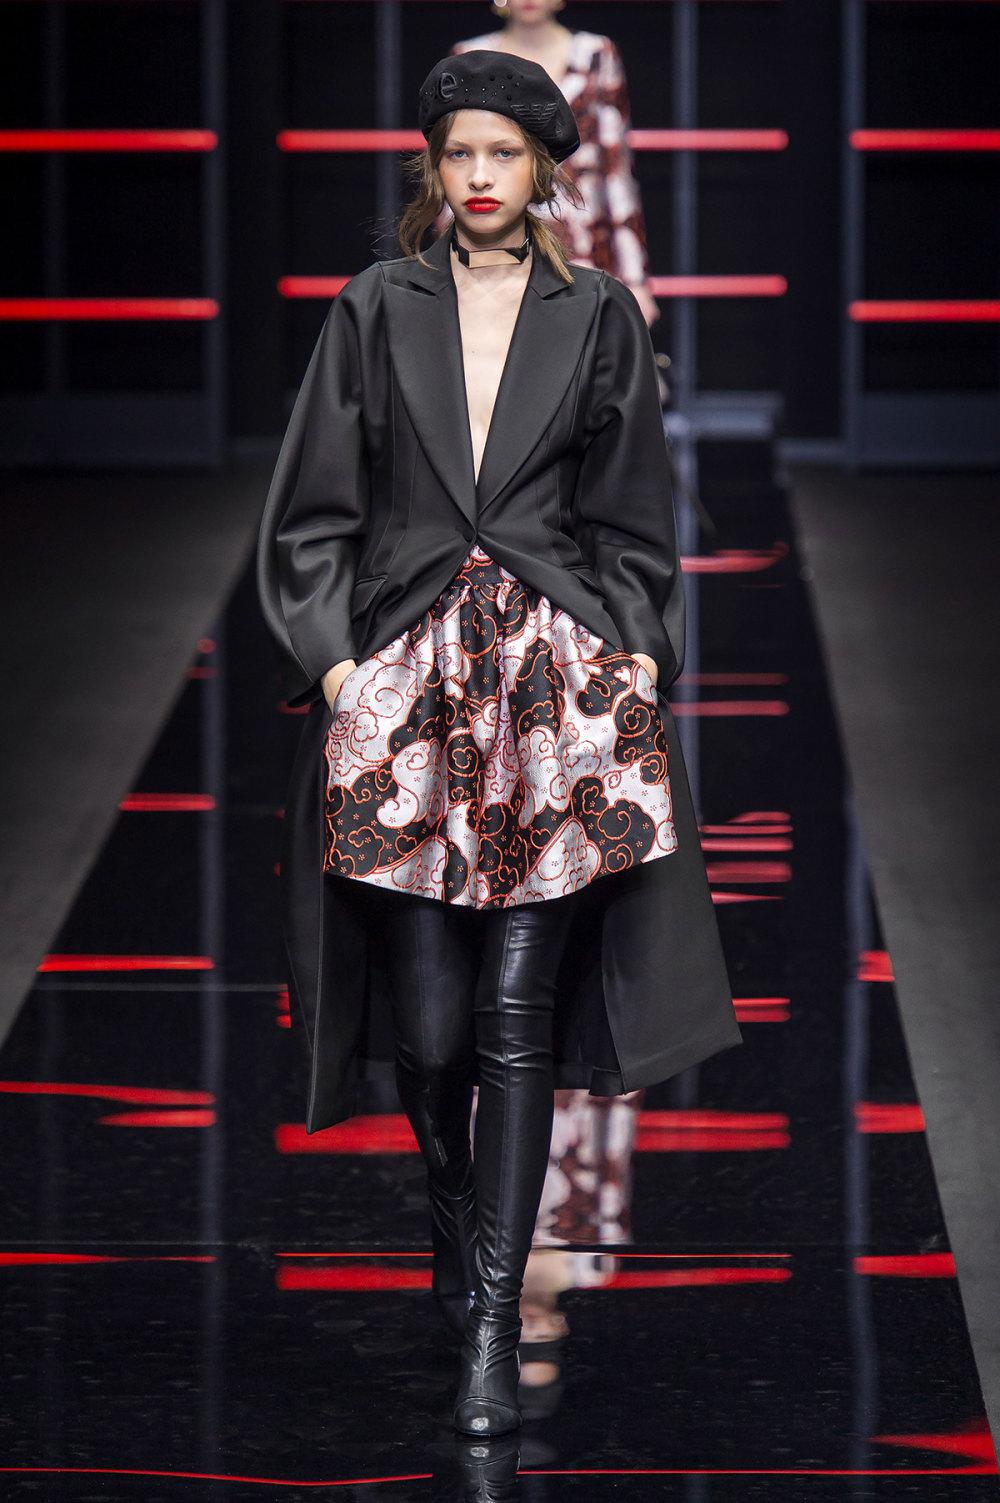 Emporio Armani时装系列畅的裤子带有柔滑裙子的鸡尾酒礼服-17.jpg